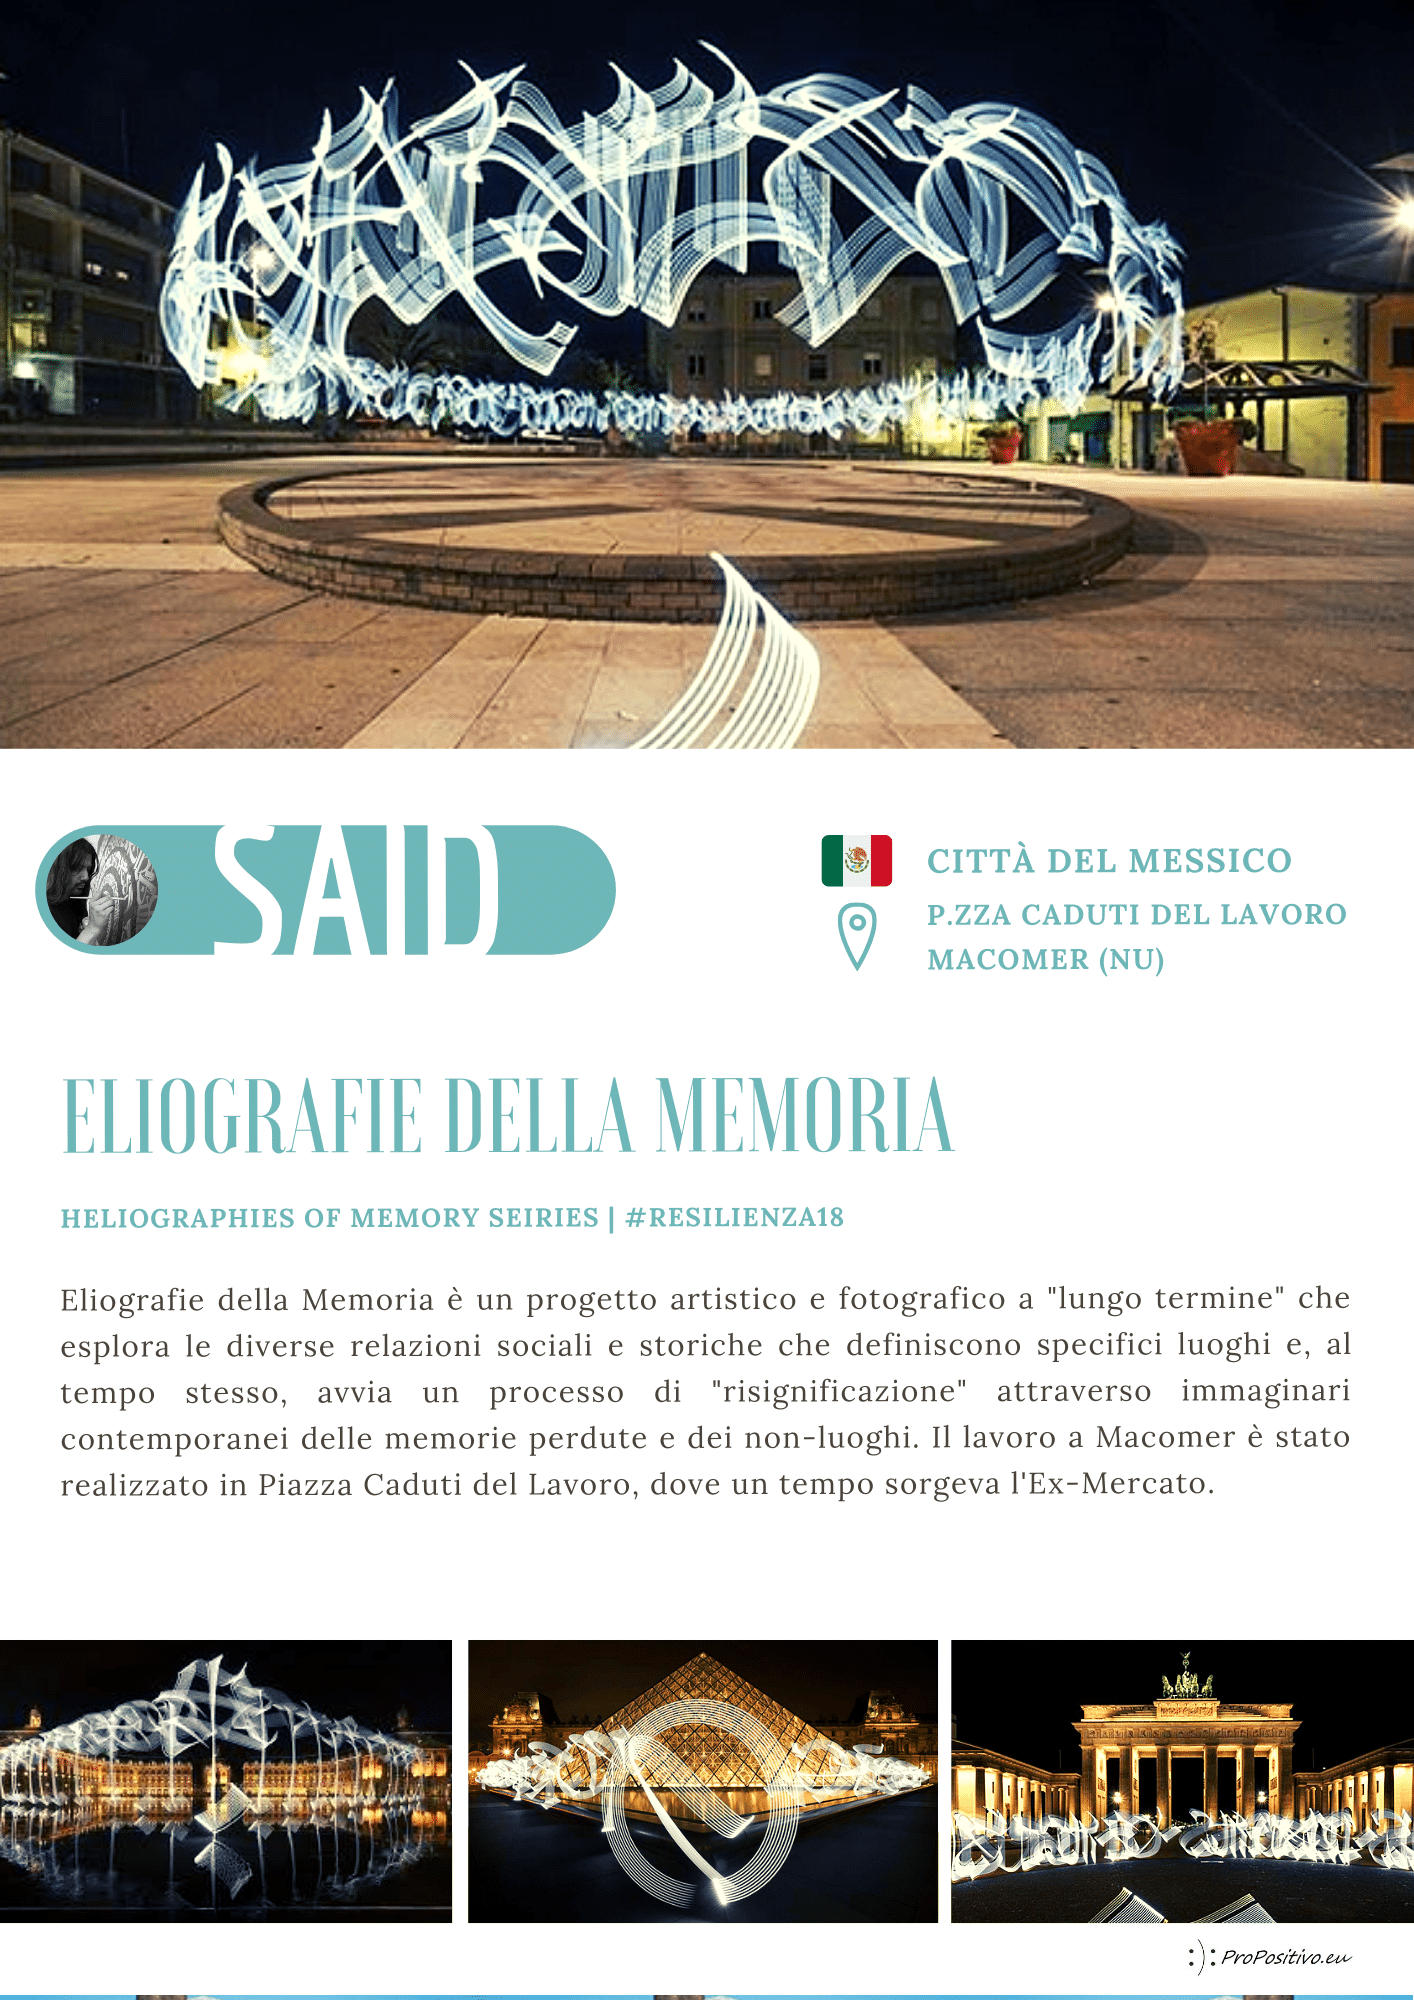 said 25 catalogo murales street art macomer sardegna festival resilienza propositivo